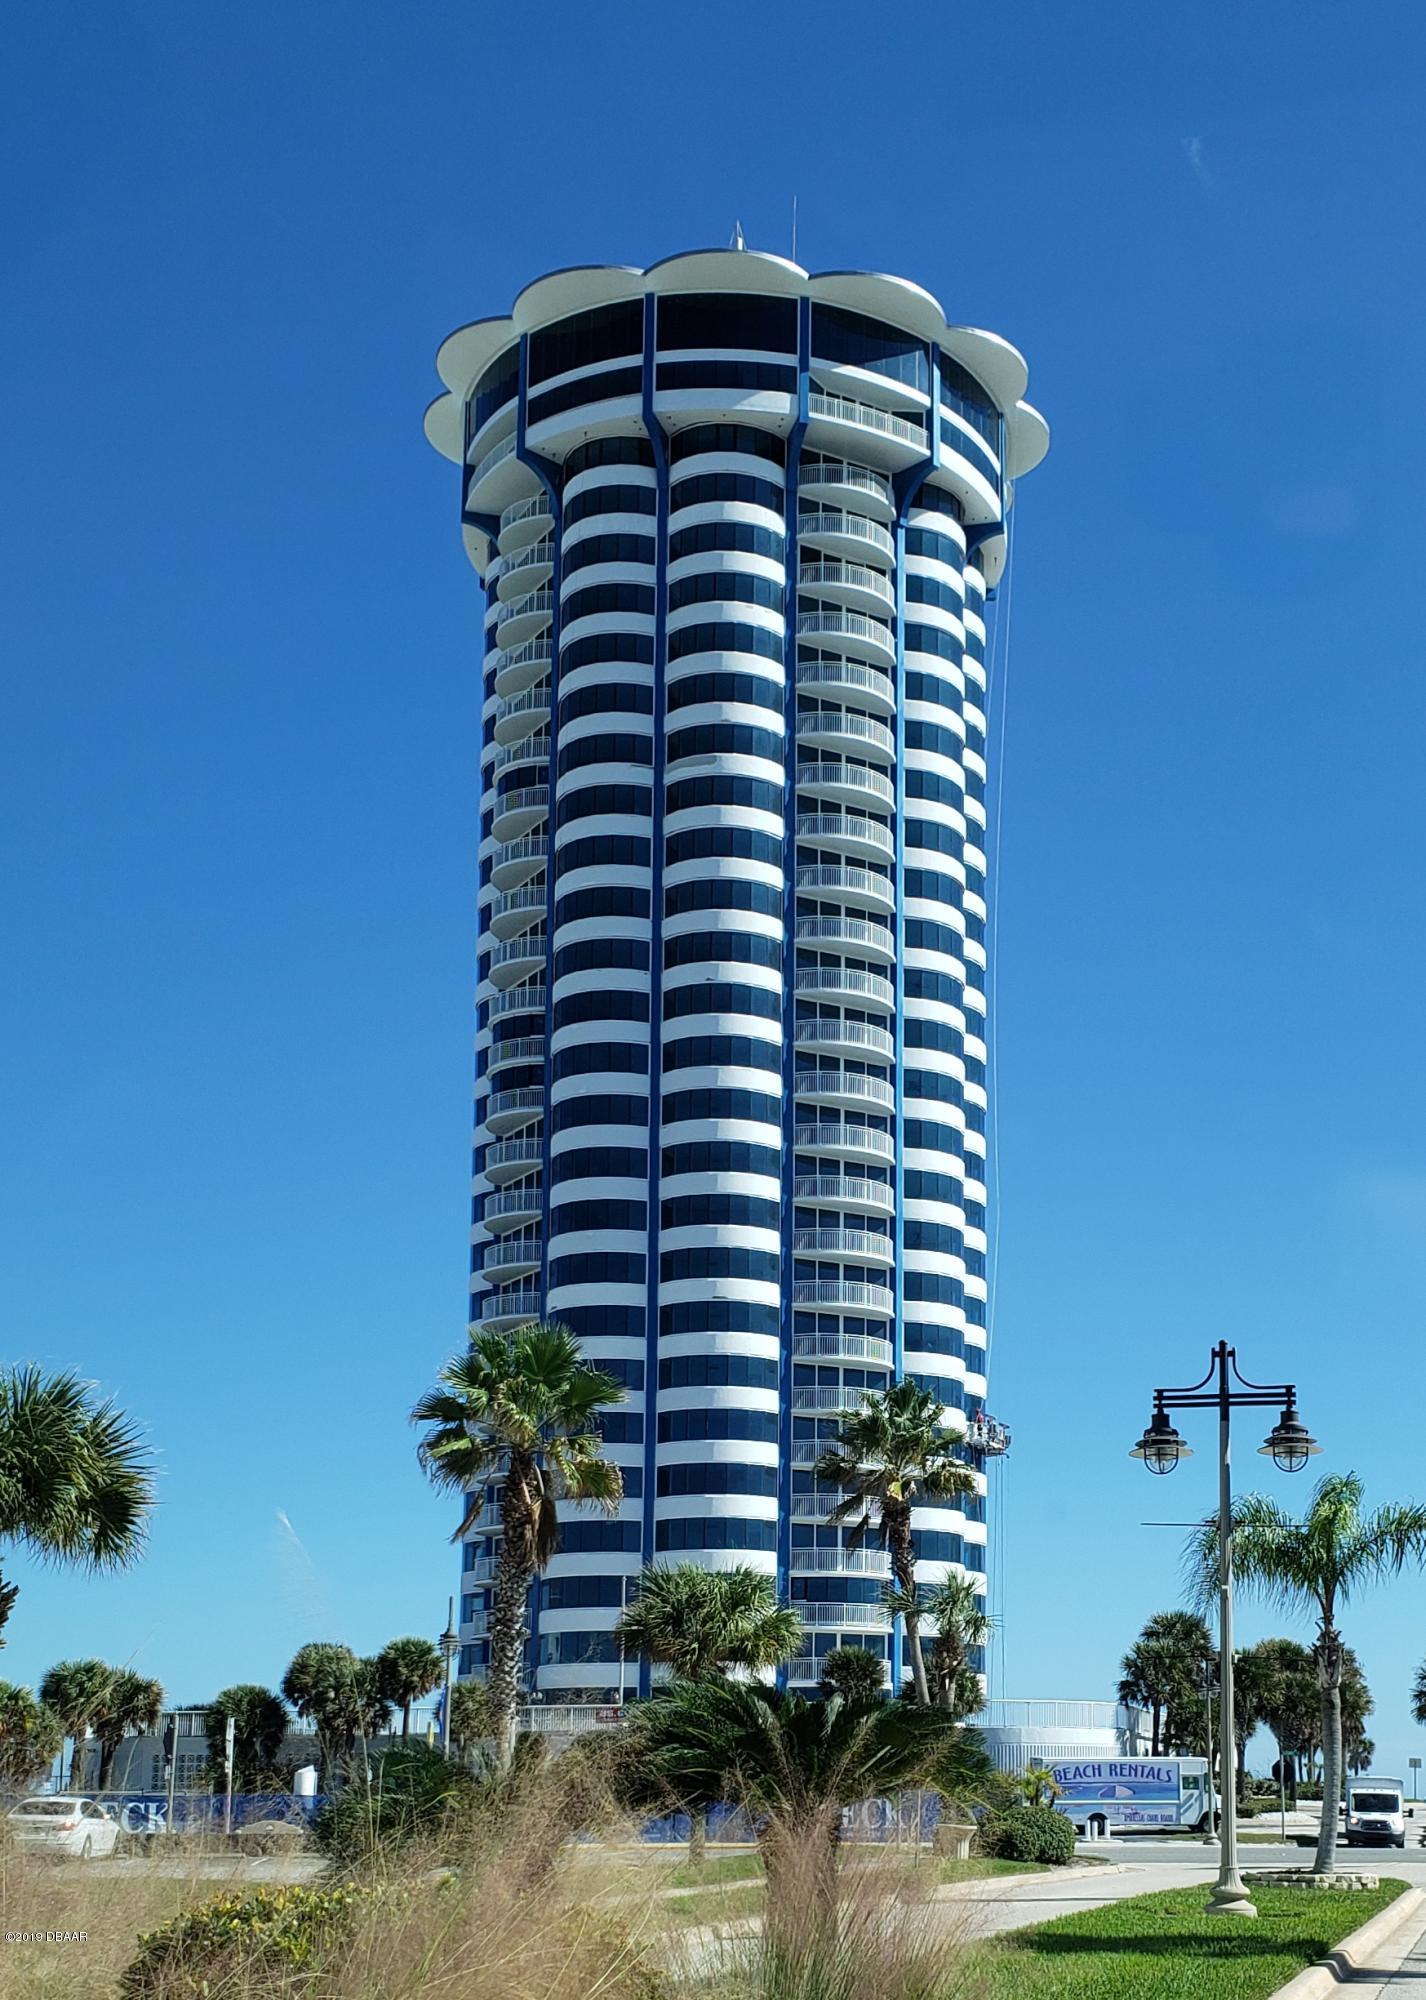 Photo of 2625 S Atlantic Avenue #12 B SW, Daytona Beach Shores, FL 32118